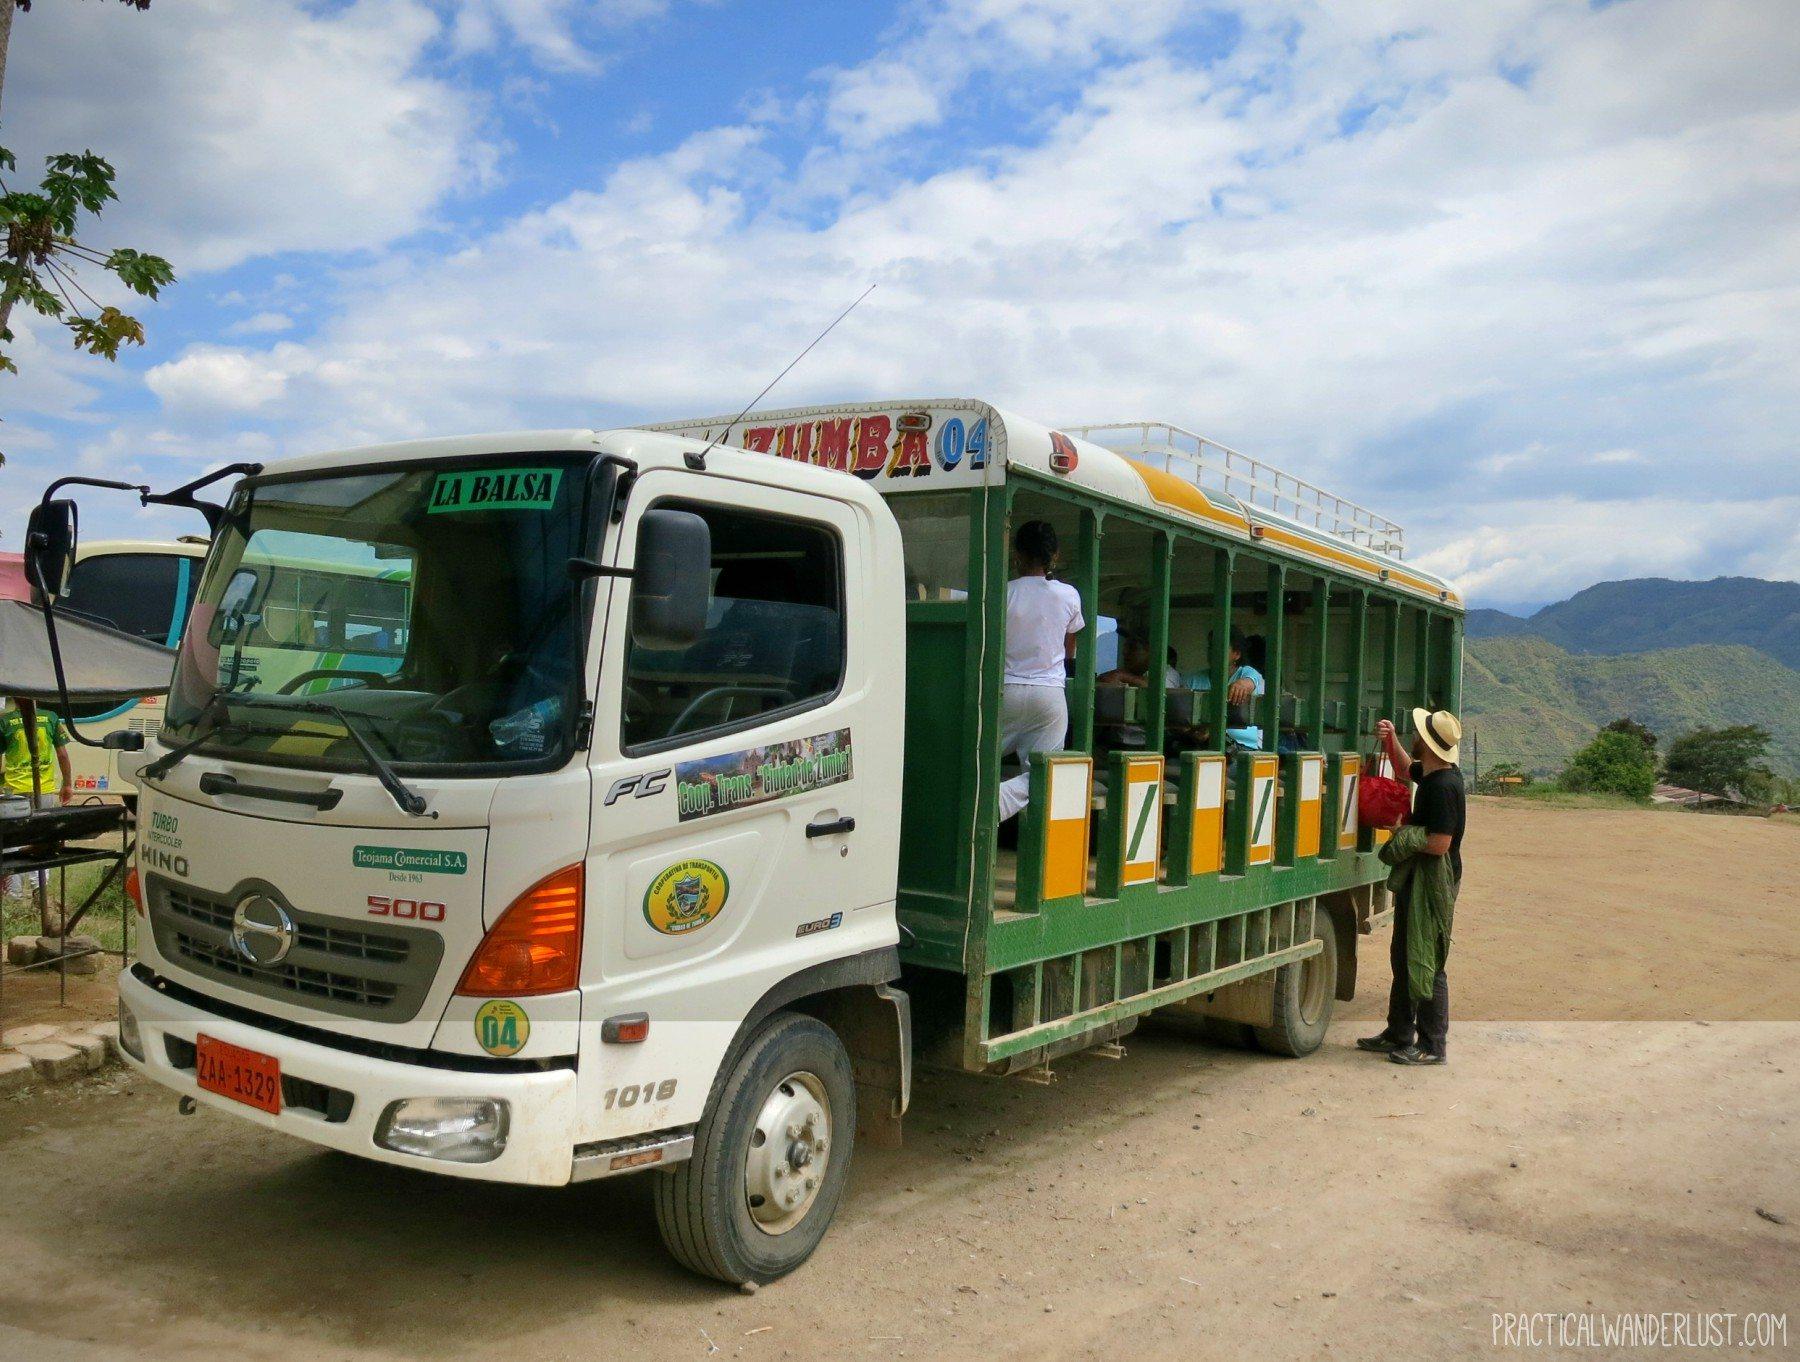 The bumpy Ranchero ride is an adventurous necessary evil to get from Ecuador to Peru via the La Balsa Border Crossing.